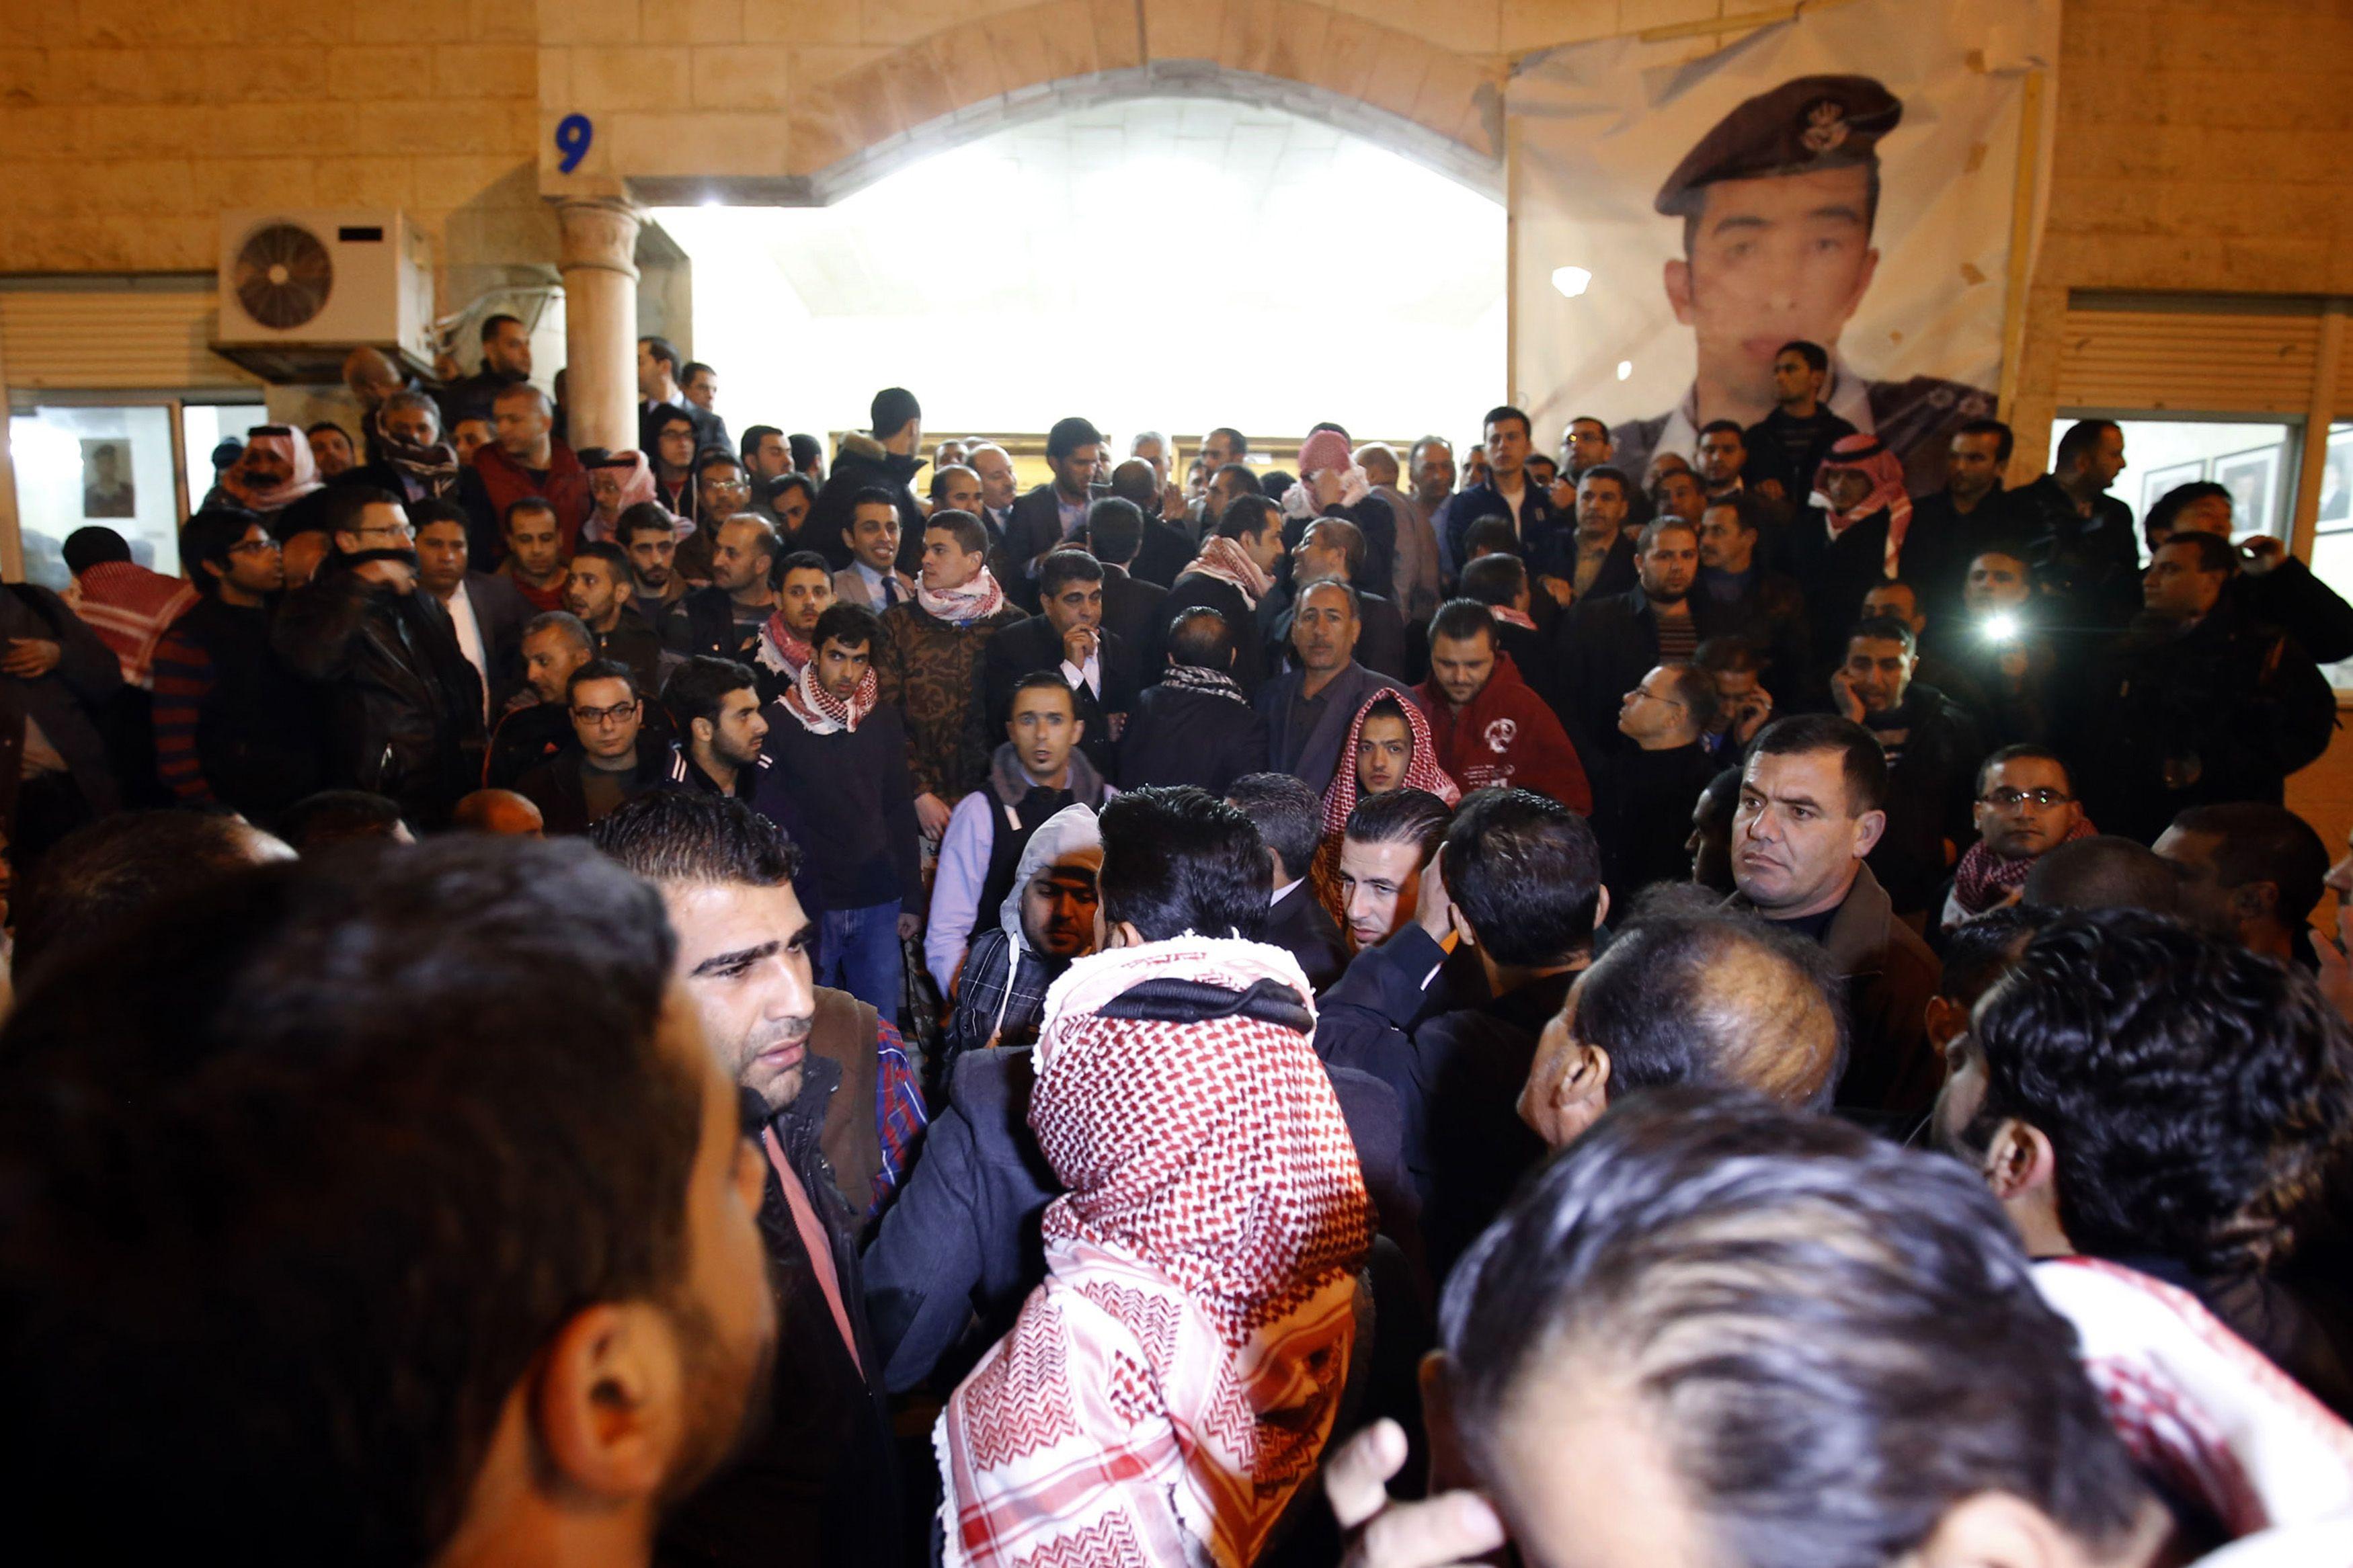 Islamic State shows burning of hostage, Jordan vows